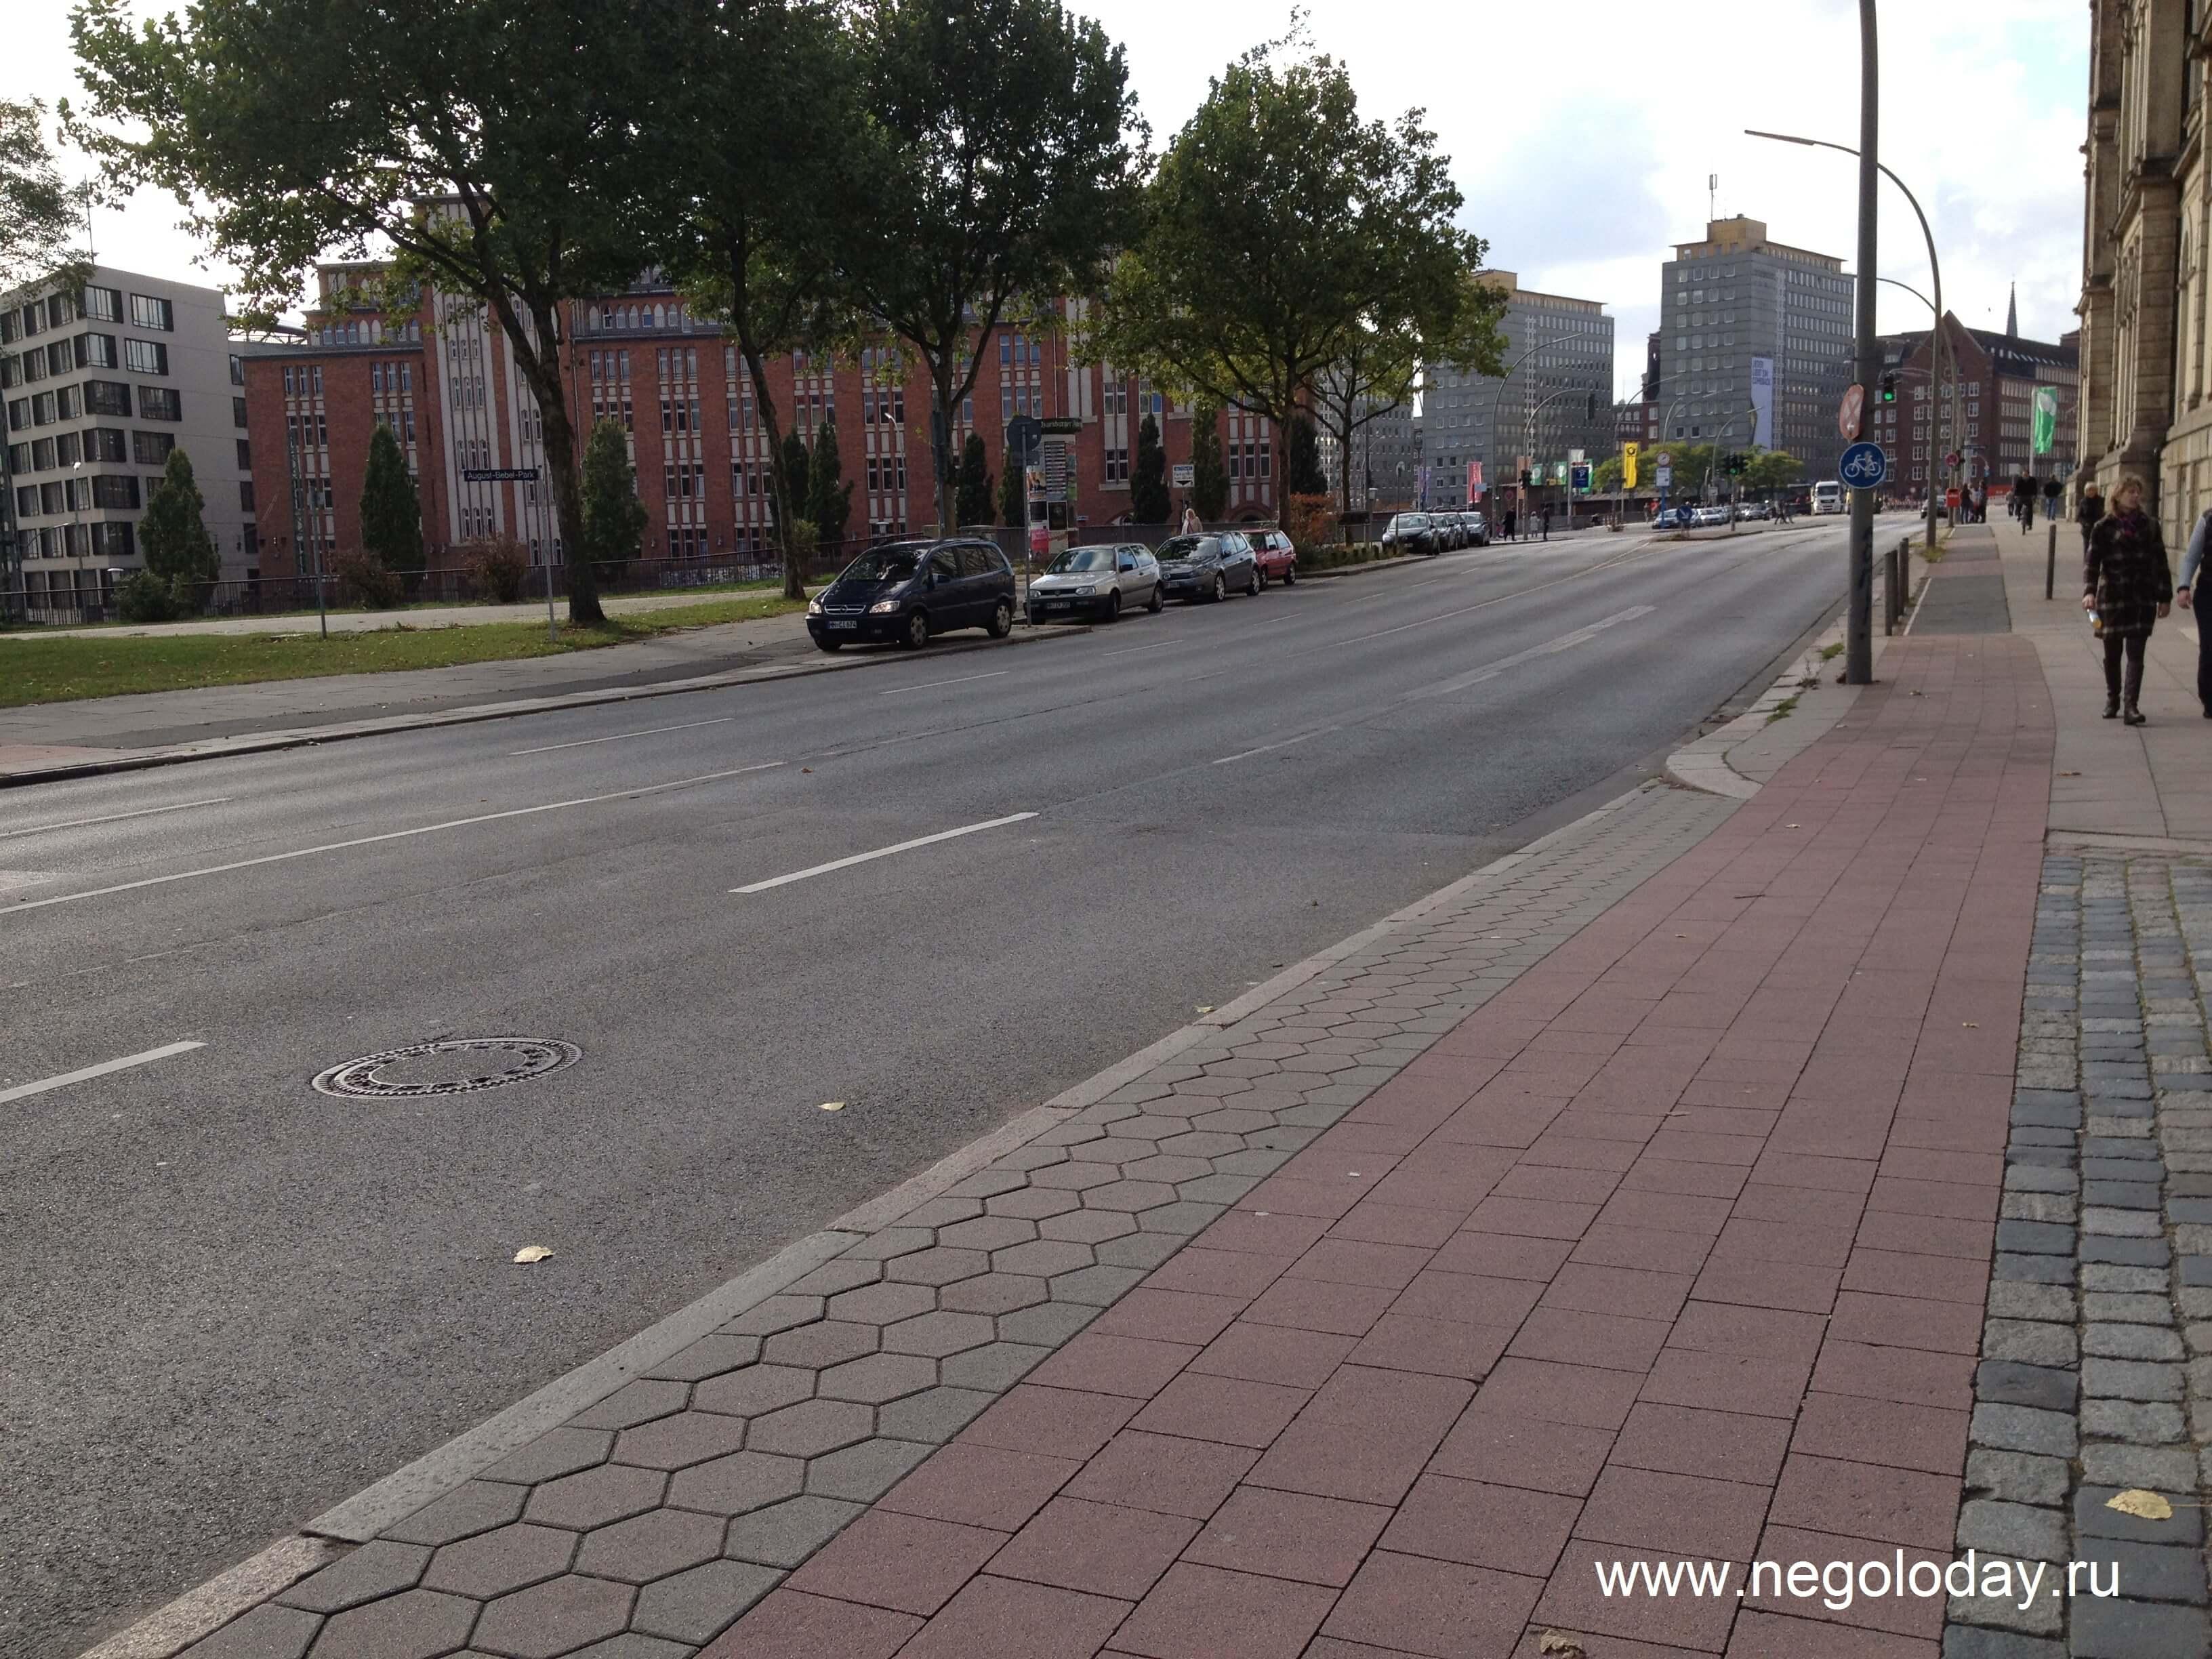 Тротуары Гамбурга Германия Центр лечебного питания www.negoloday.ru